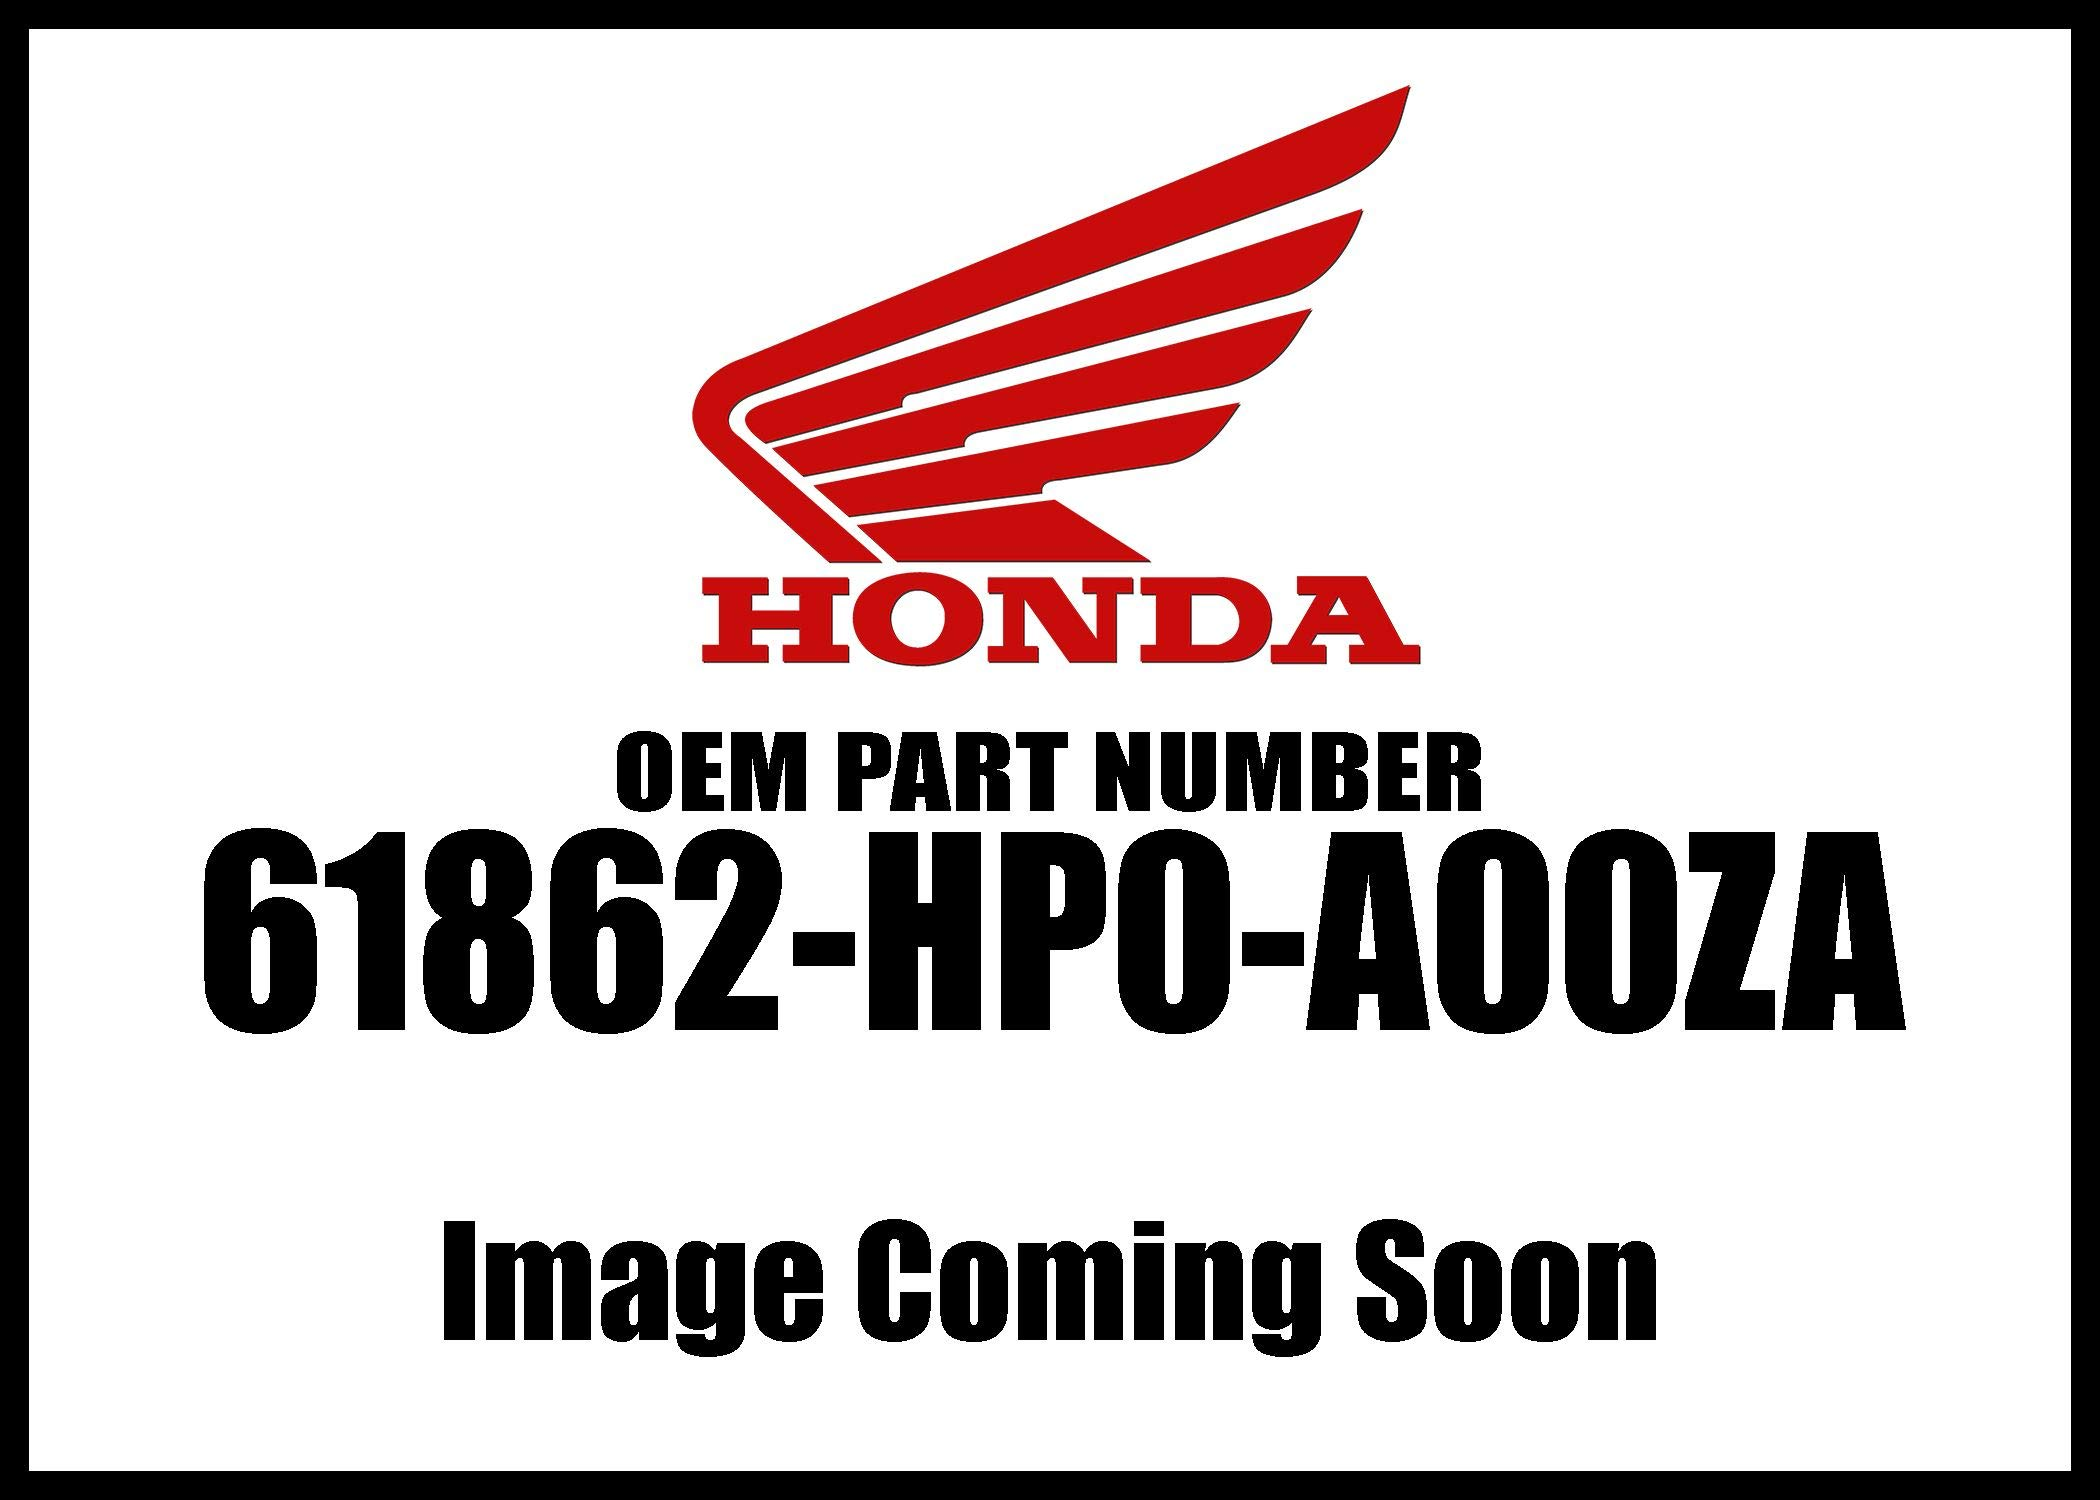 HONDA 61862-HP0-A00ZA SPH GUARD, R. *NH1*